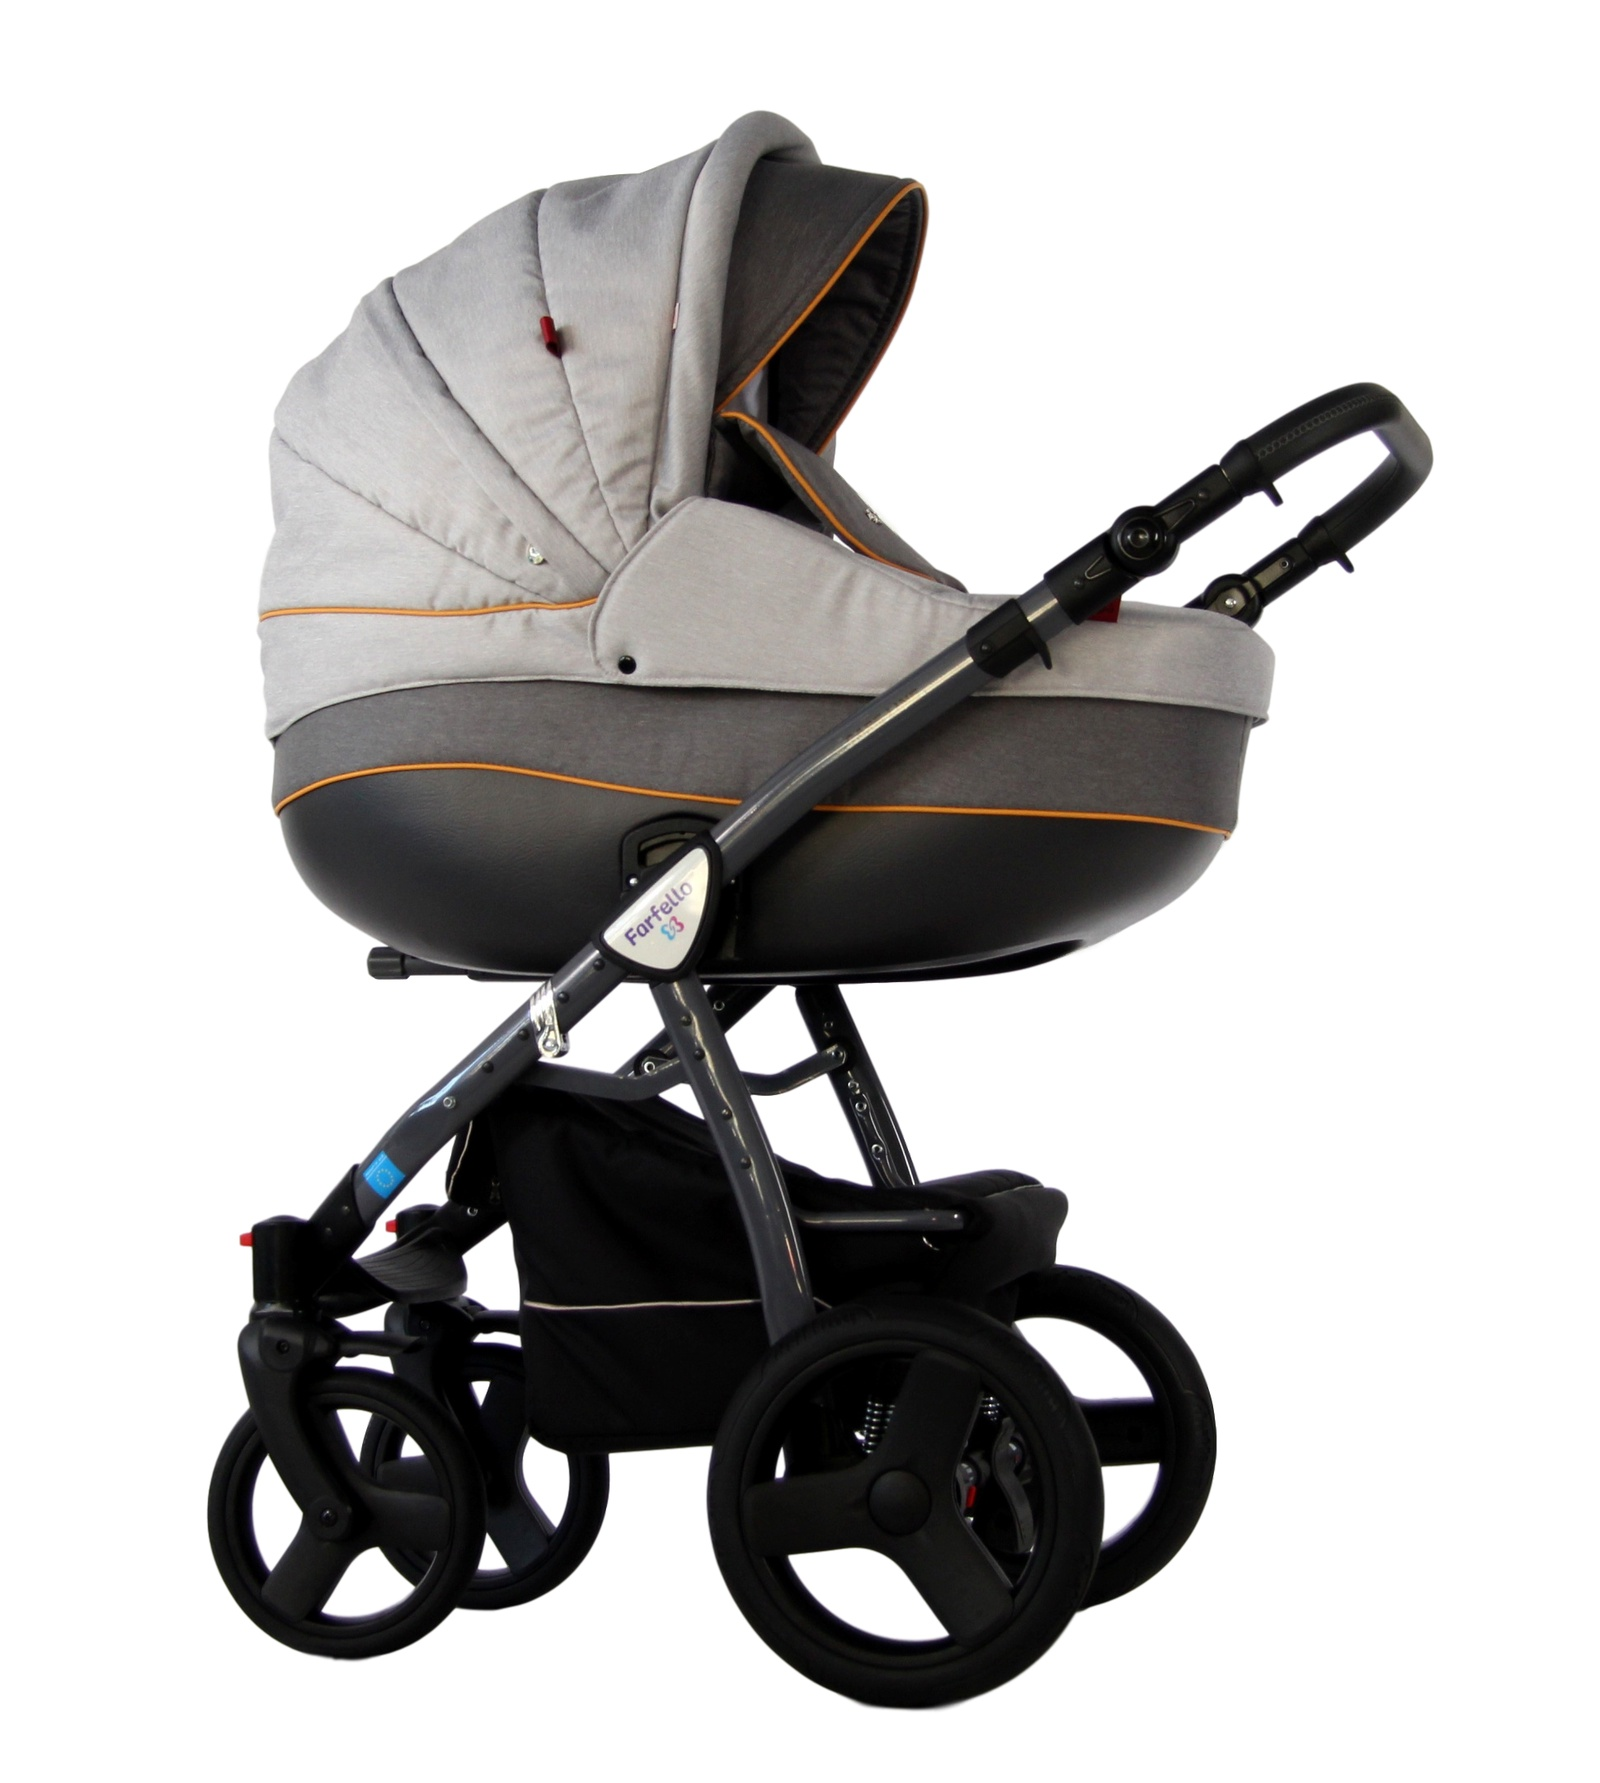 Коляска-люлька Farfello CARE-LINE 2в1 светло-серый коляска люлька farfello fly line 3в1